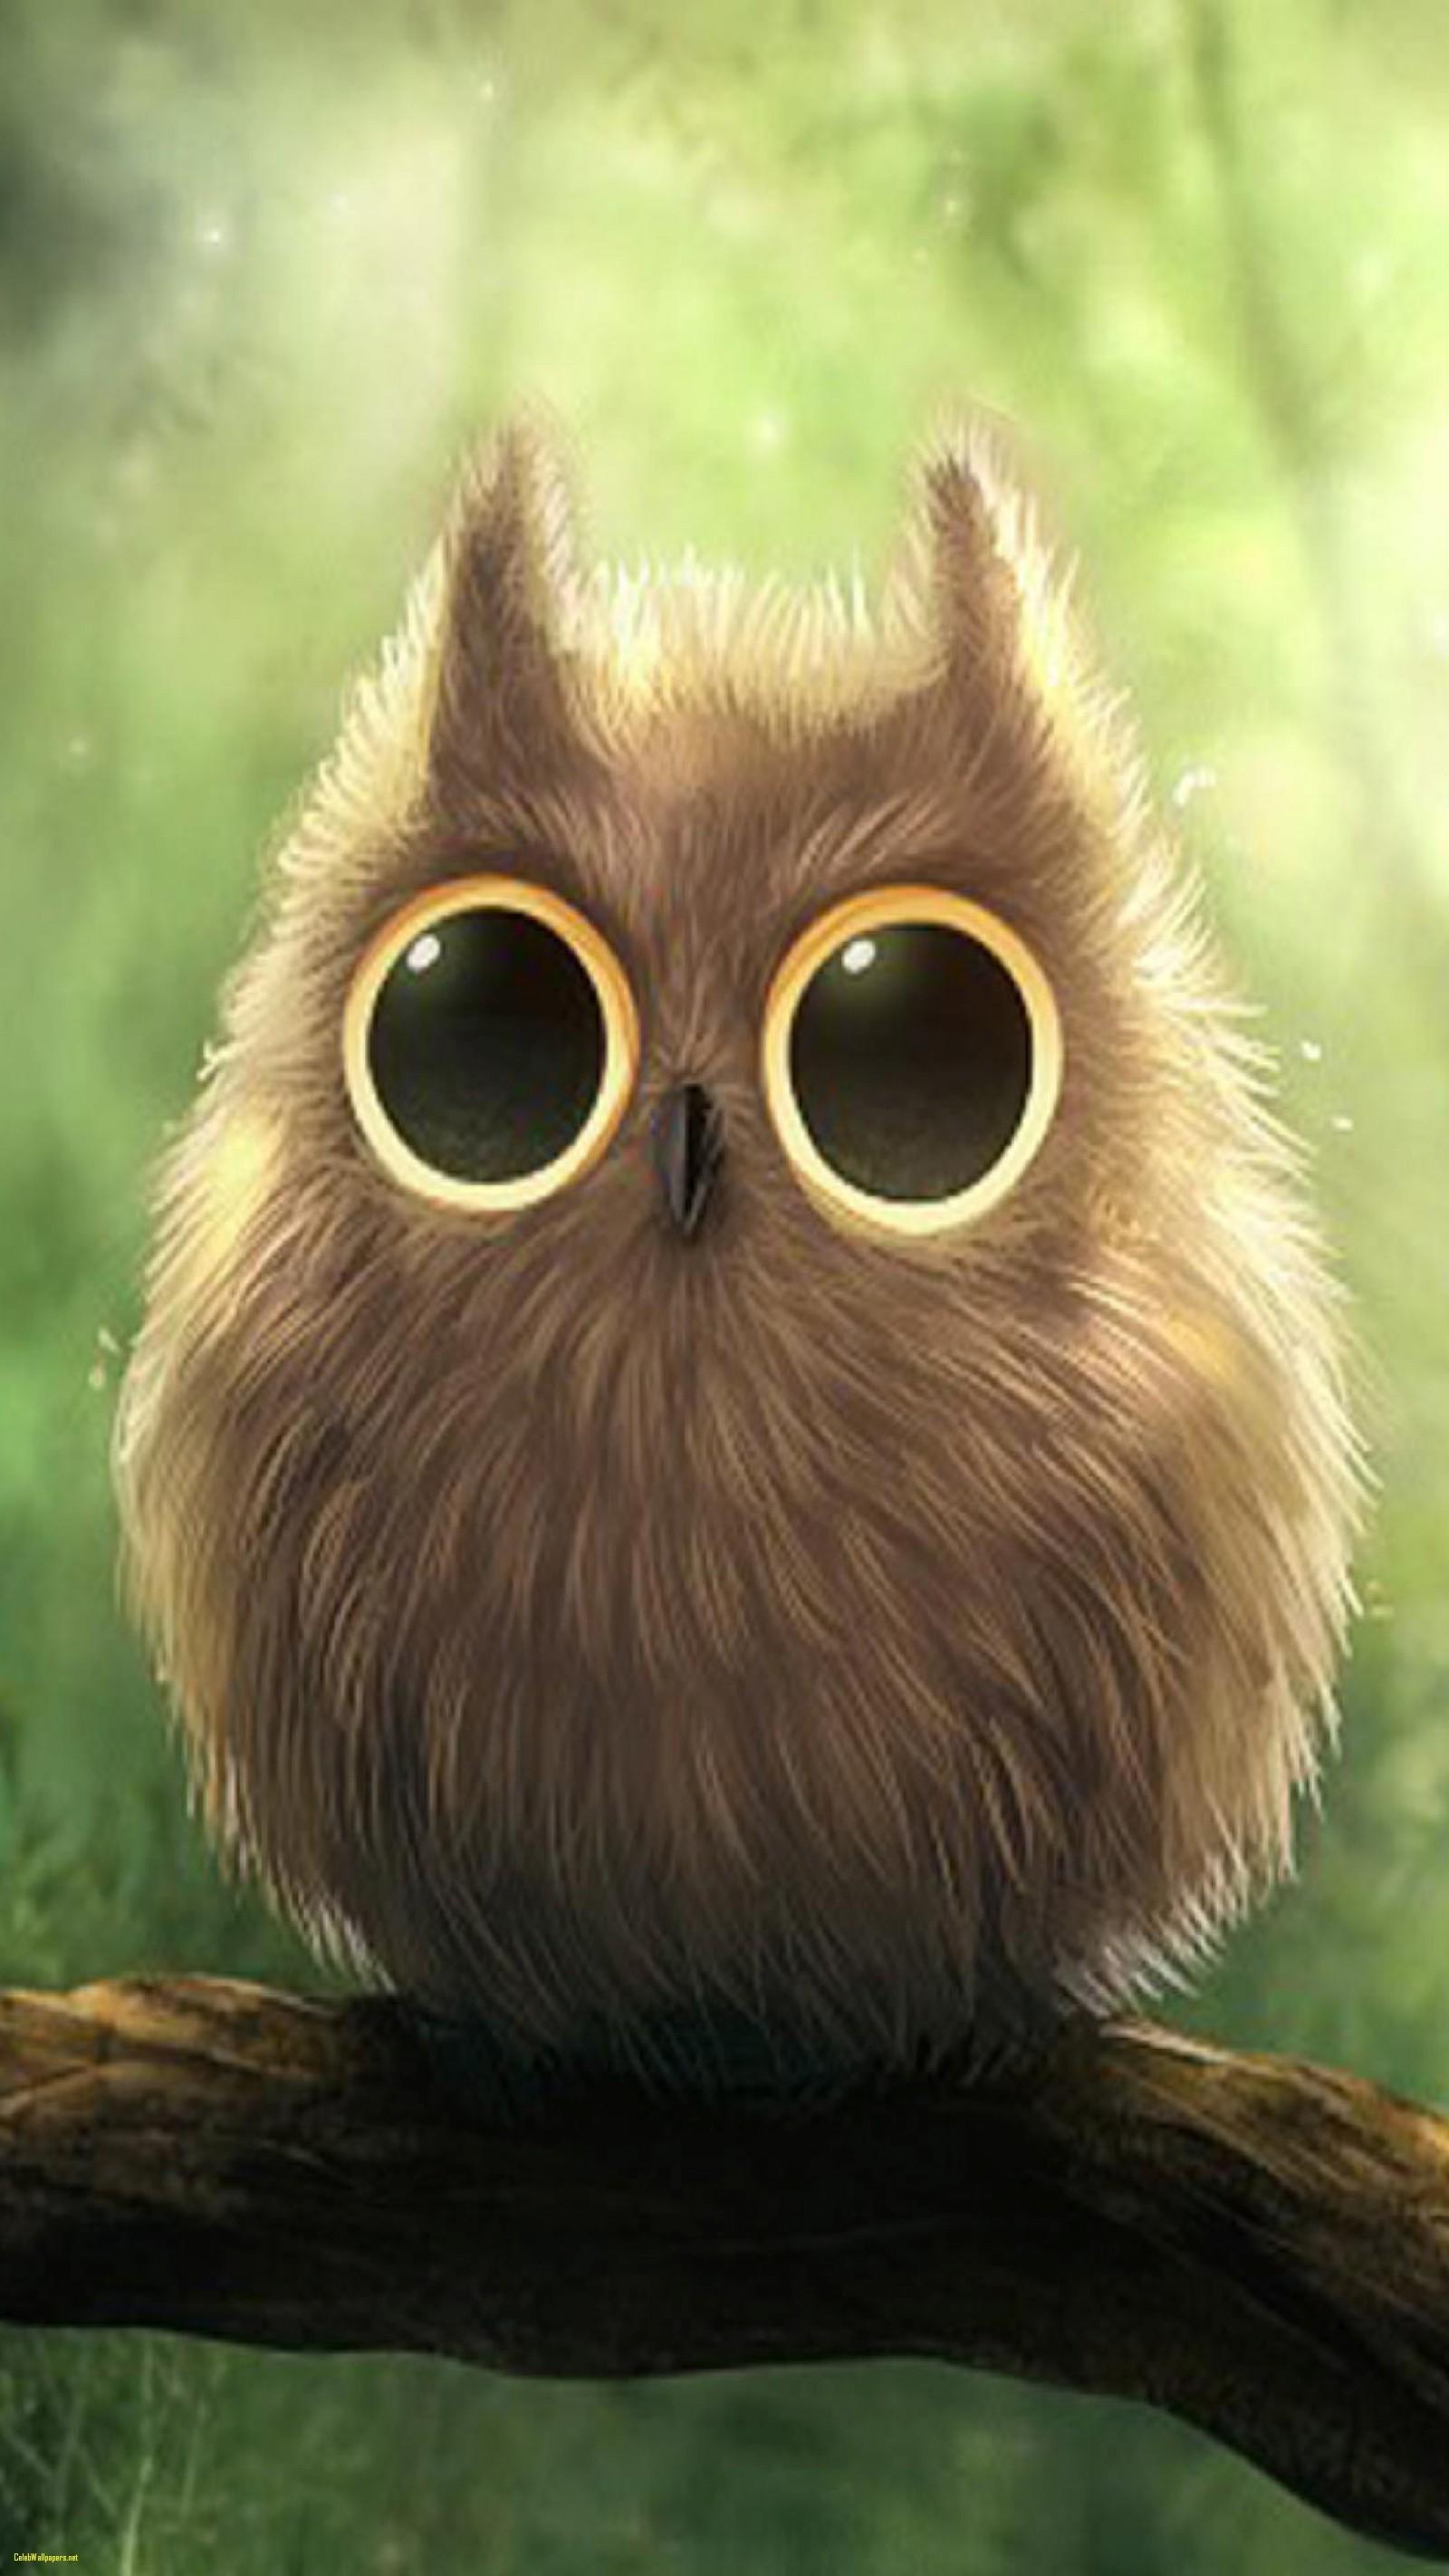 Res: 1600x2844, ... Cute Owl Wallpaper Best Of Cute Owl Big Eyes iPhone 6 Plus Hd Wallpaper  Hd Free